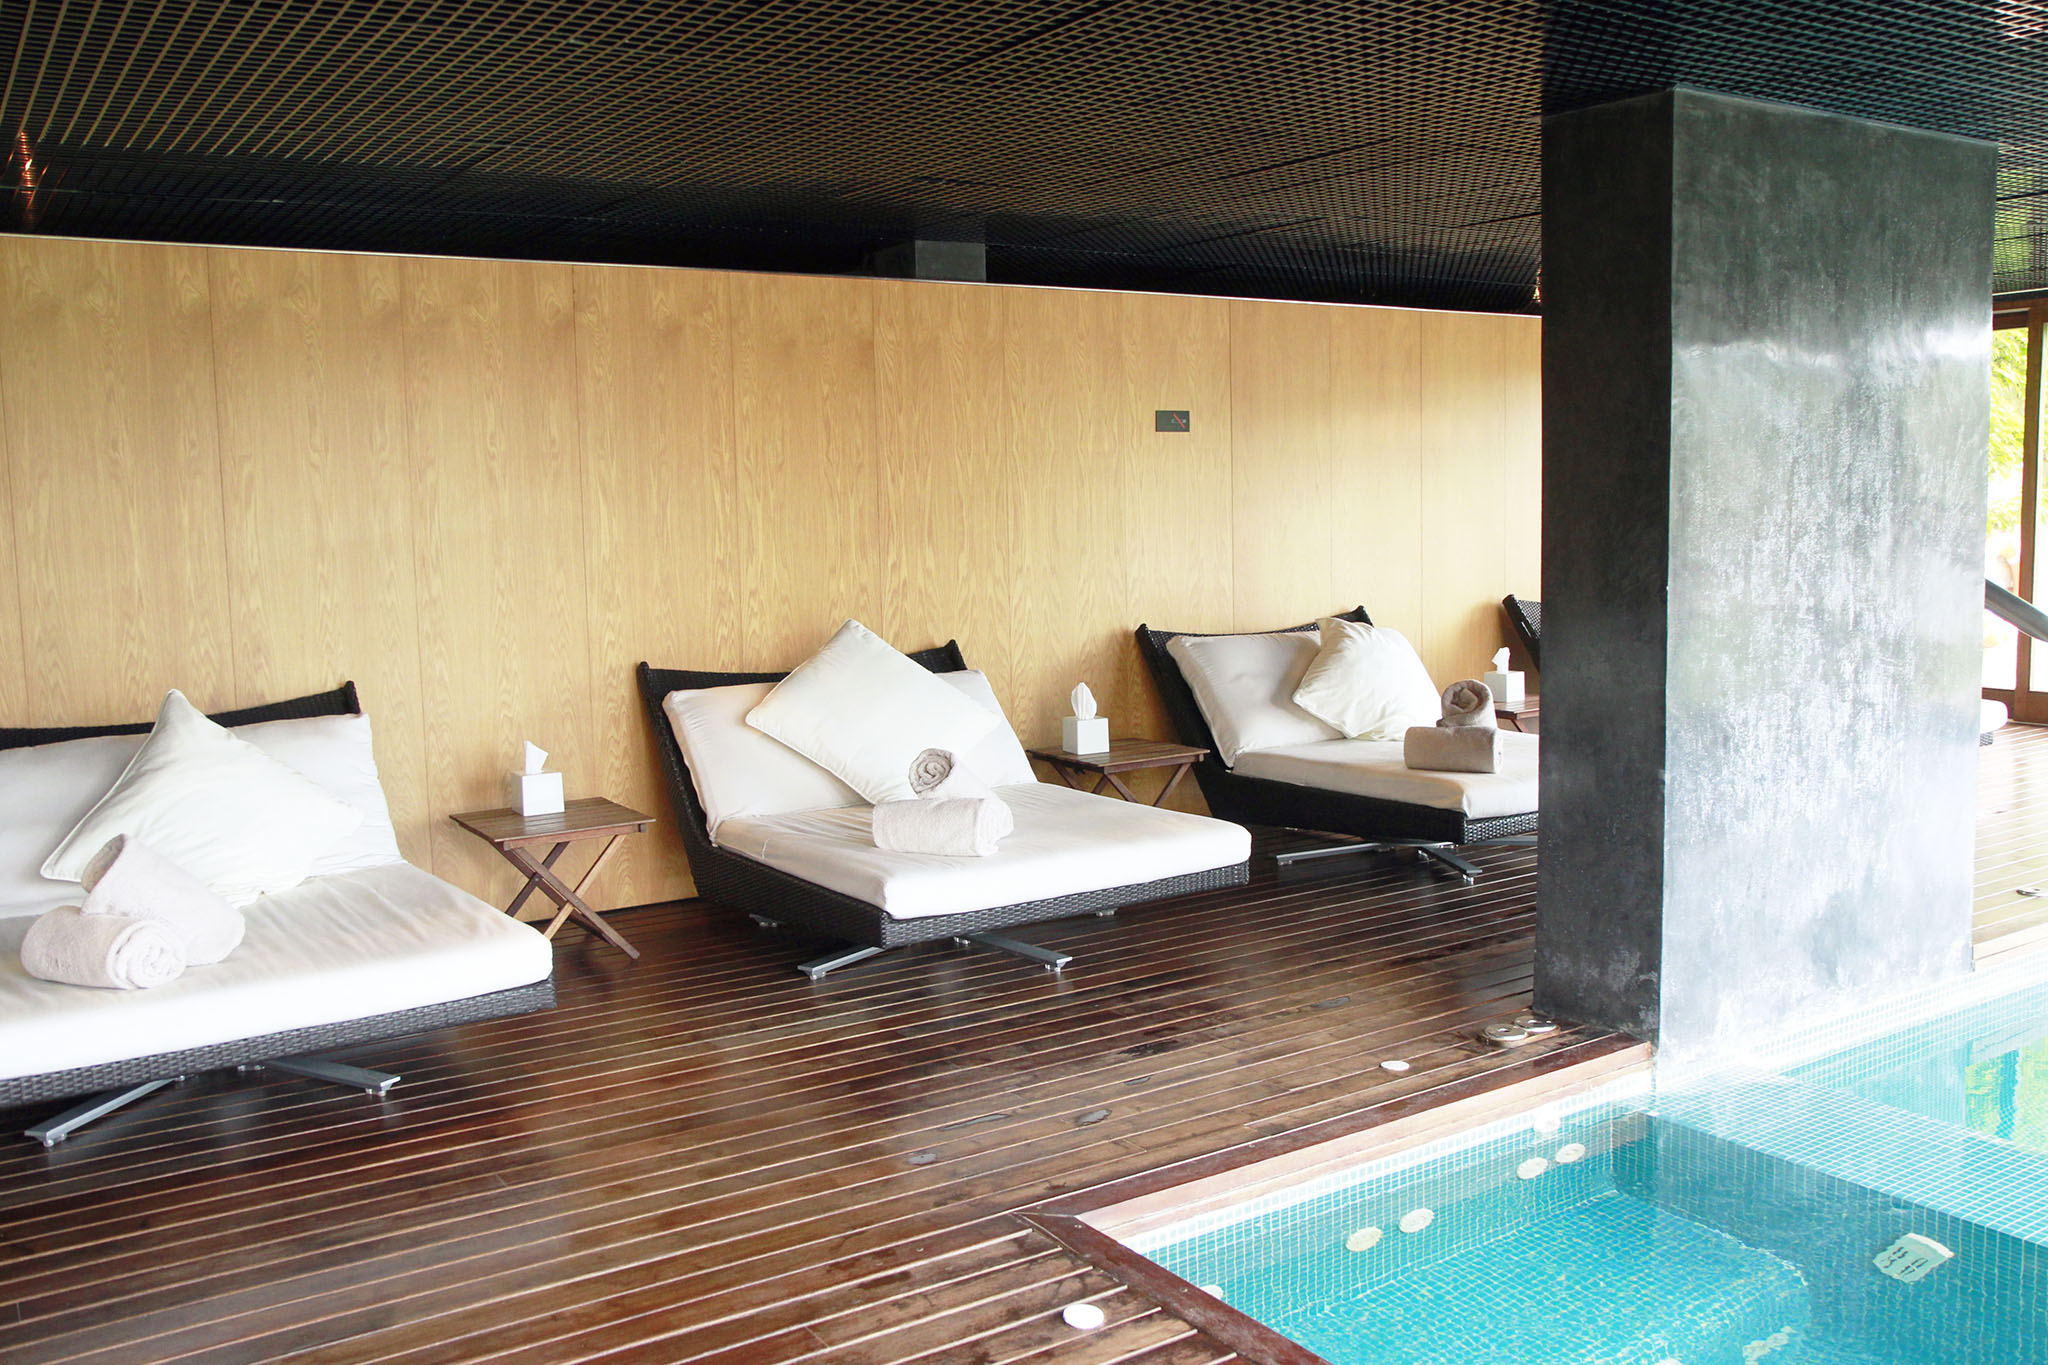 2017-04-Son-Brull - son-brull-hotel-spa-mallorca-nectarandpulse-pool-area-2.jpg